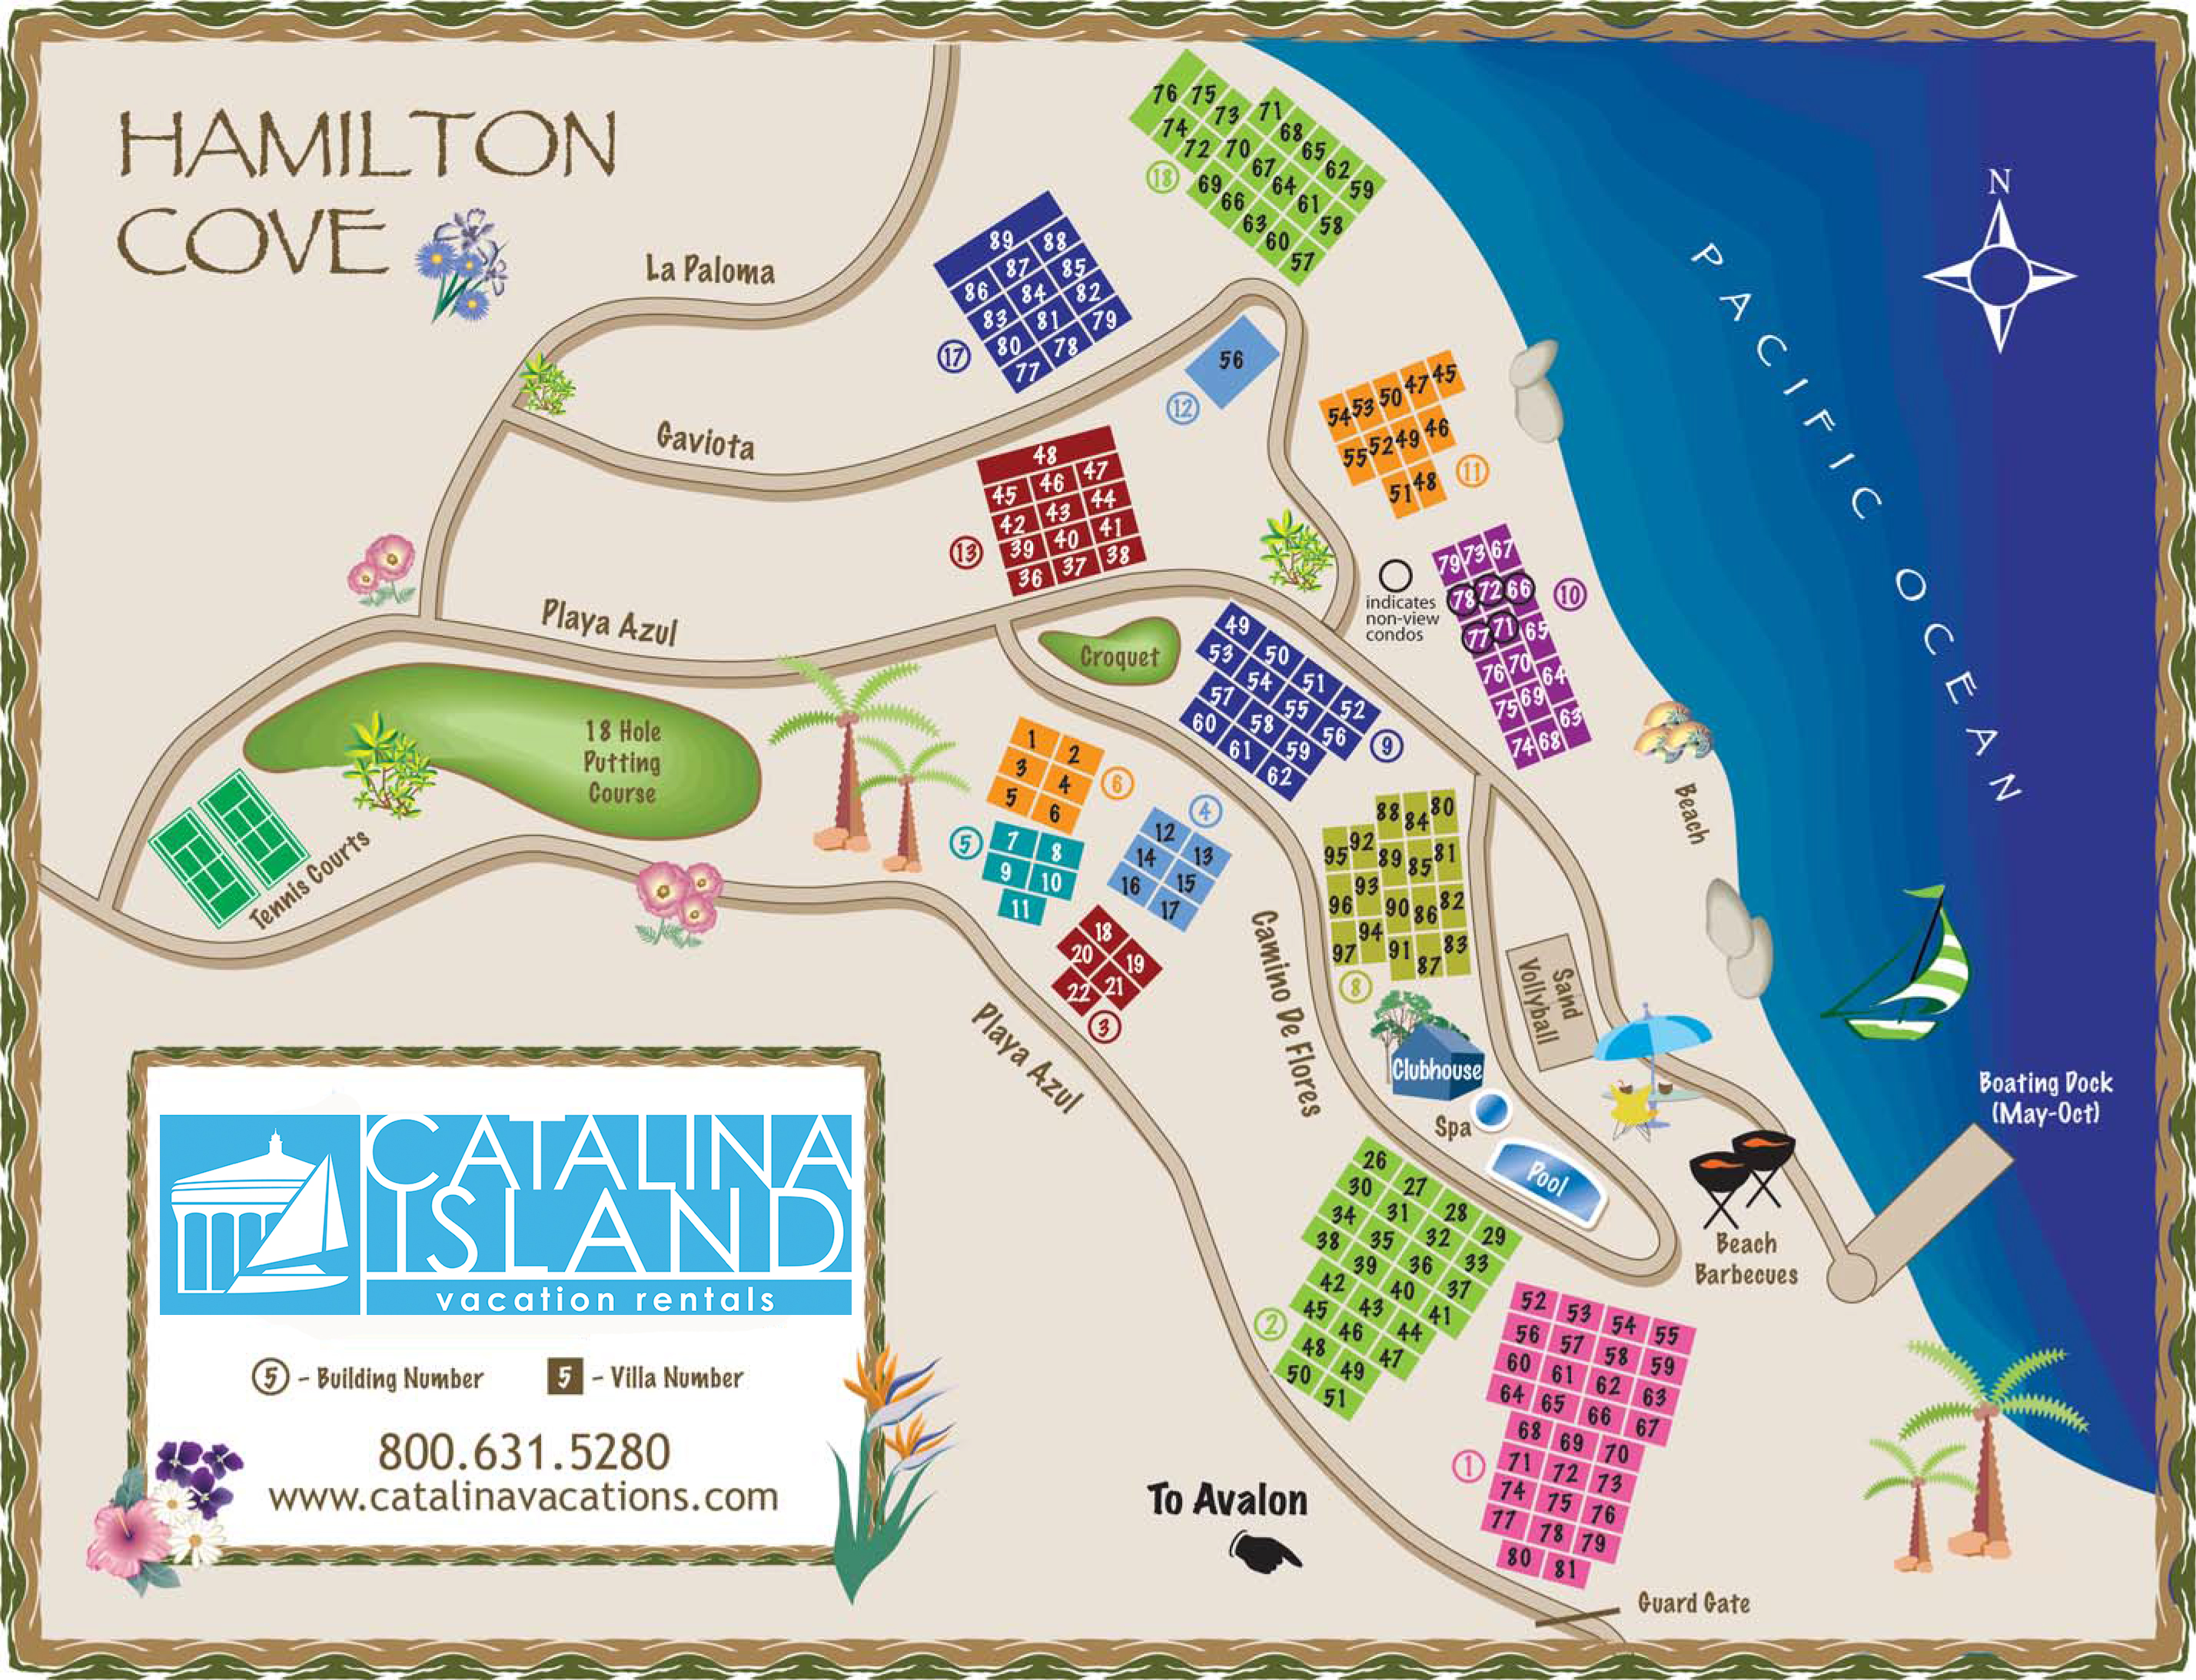 Hamilton Cove Map 2019 | Catalina Island Vacation Rentals